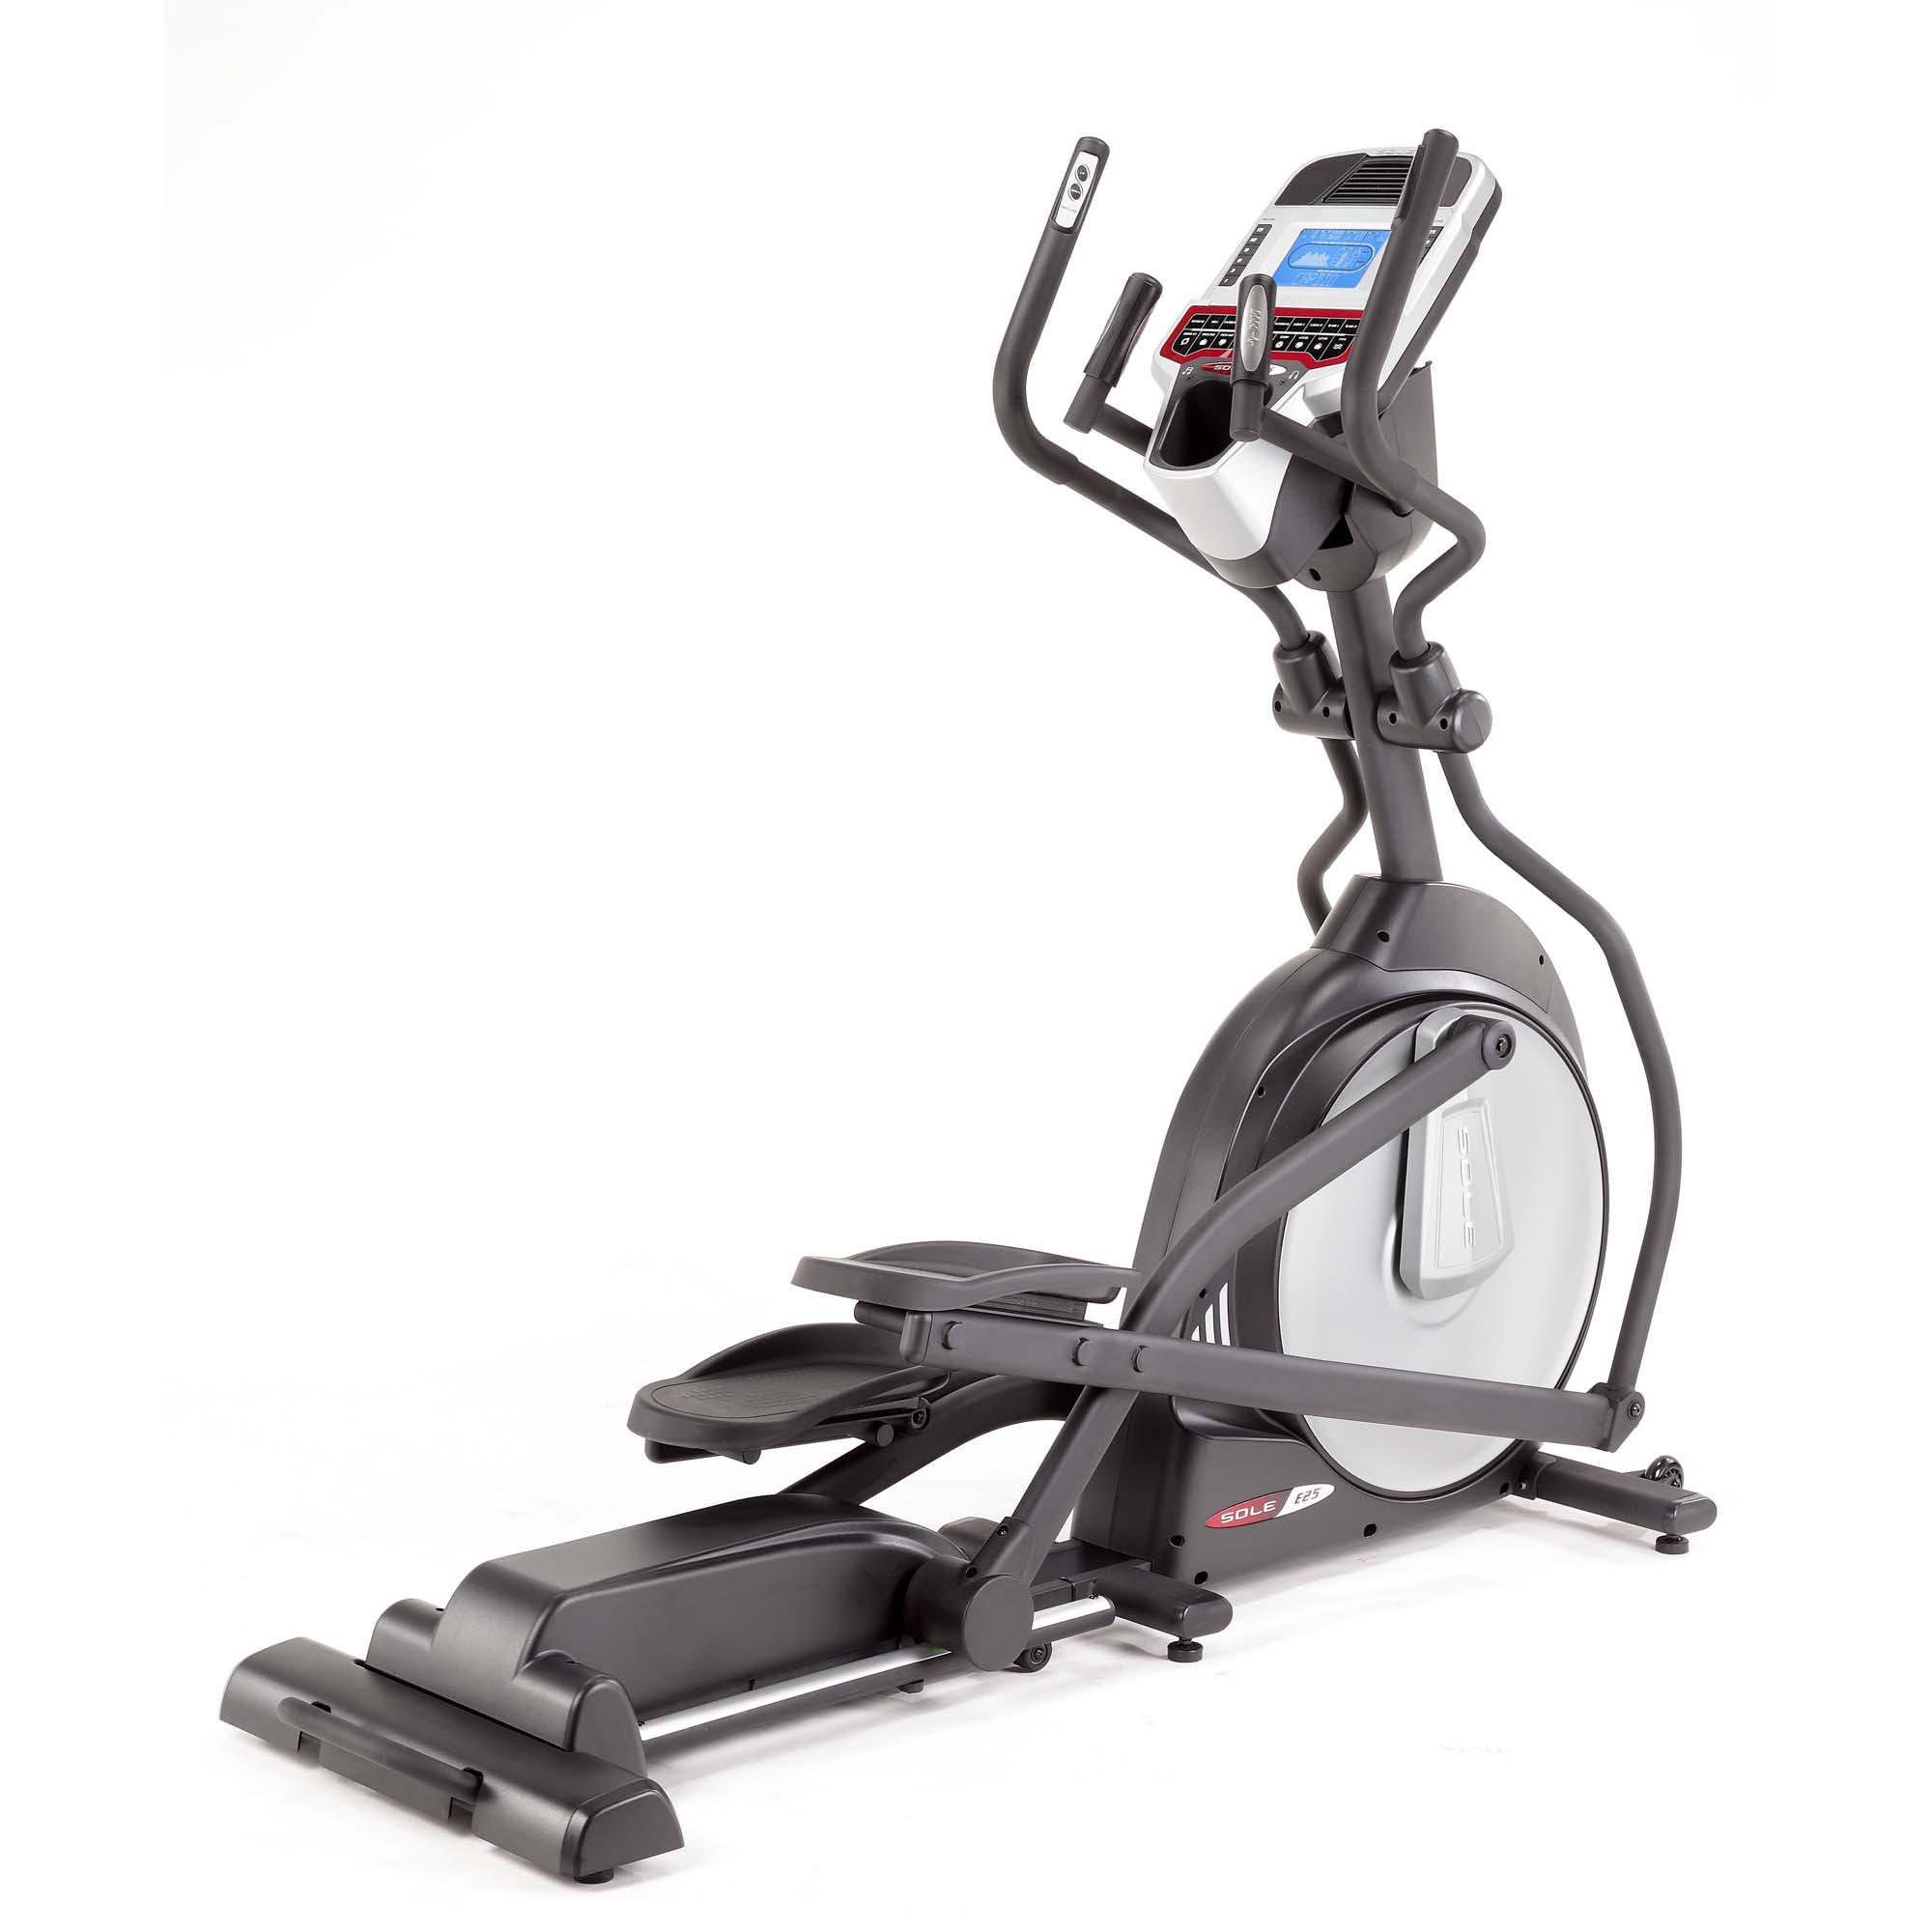 exercise machine looks like elliptical